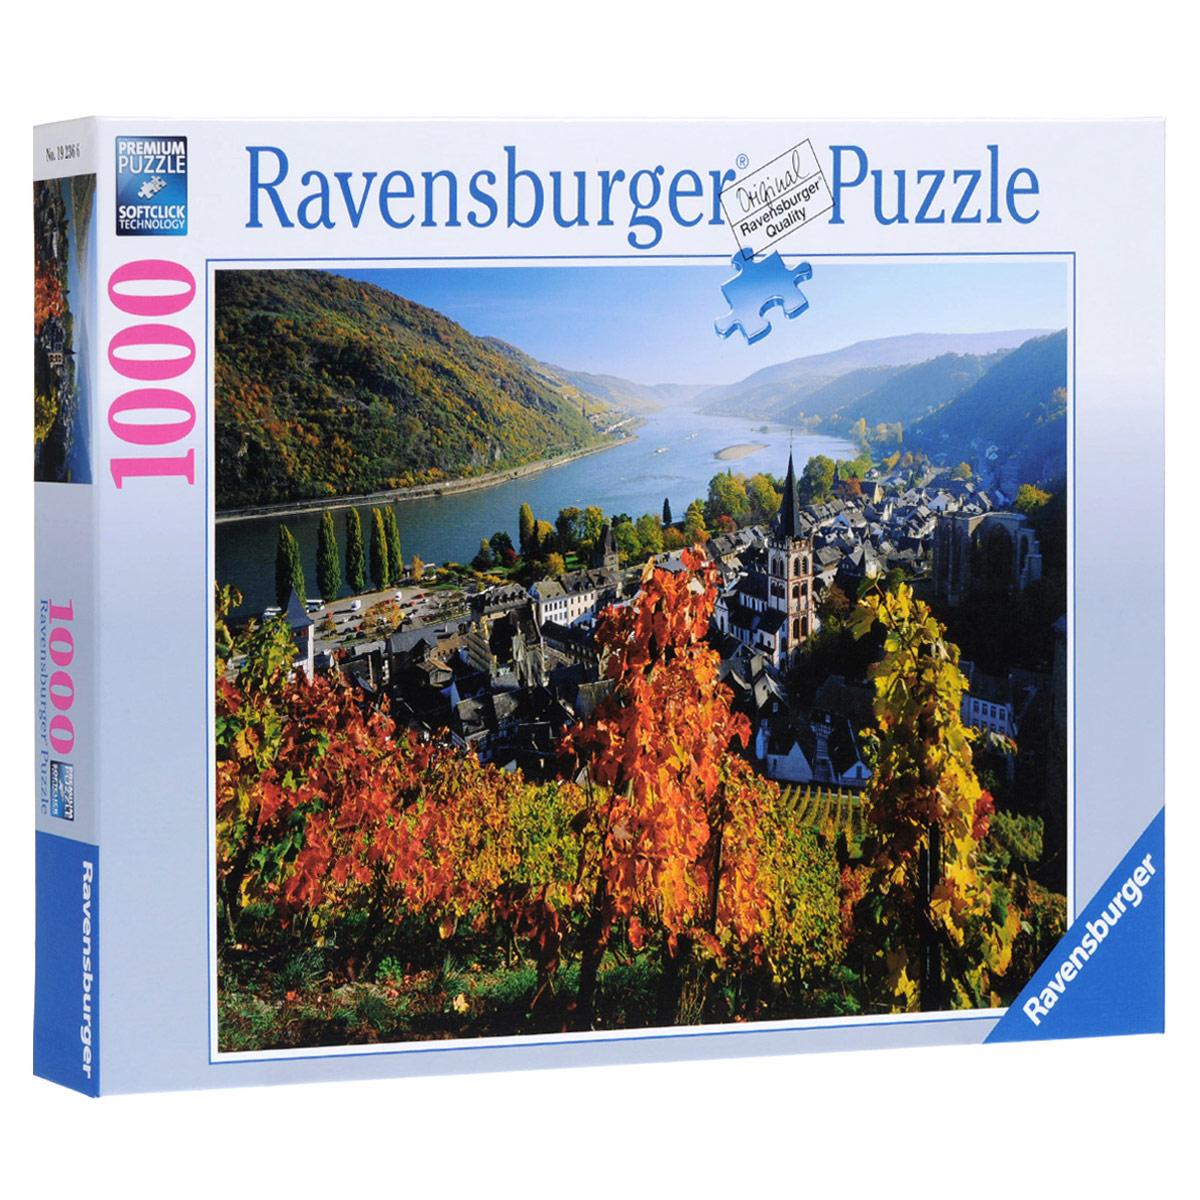 Ravensburger ����� �� �����. ����, 1000 ��������� - Ravensburger19236���� Ravensburger ����� �� �����, ��� ��������, �������� �� ���� ������ �������. ������ ���� ����, ���������� � ���� 1000 ���������, �� �������� ������������ �������. ������ ������ ����� ���� ����� � �������� ������ �� ��� �����. ��� ���� ���������� �������! ���� ���������� �� ������� ����������� ��������. ��� ����������� ��������� ������������� � ���������� �� �������������� ������. ����� - ������������� ����������� ���� ��� �����. ��������� ����� ��������� � ������� ������ �������� ���, ��������� ����������������, ���������� ��������, �������� � ���������� �����, � ������ � �������������� �������, ���� ����������� � ��������, ������������ � ��������.